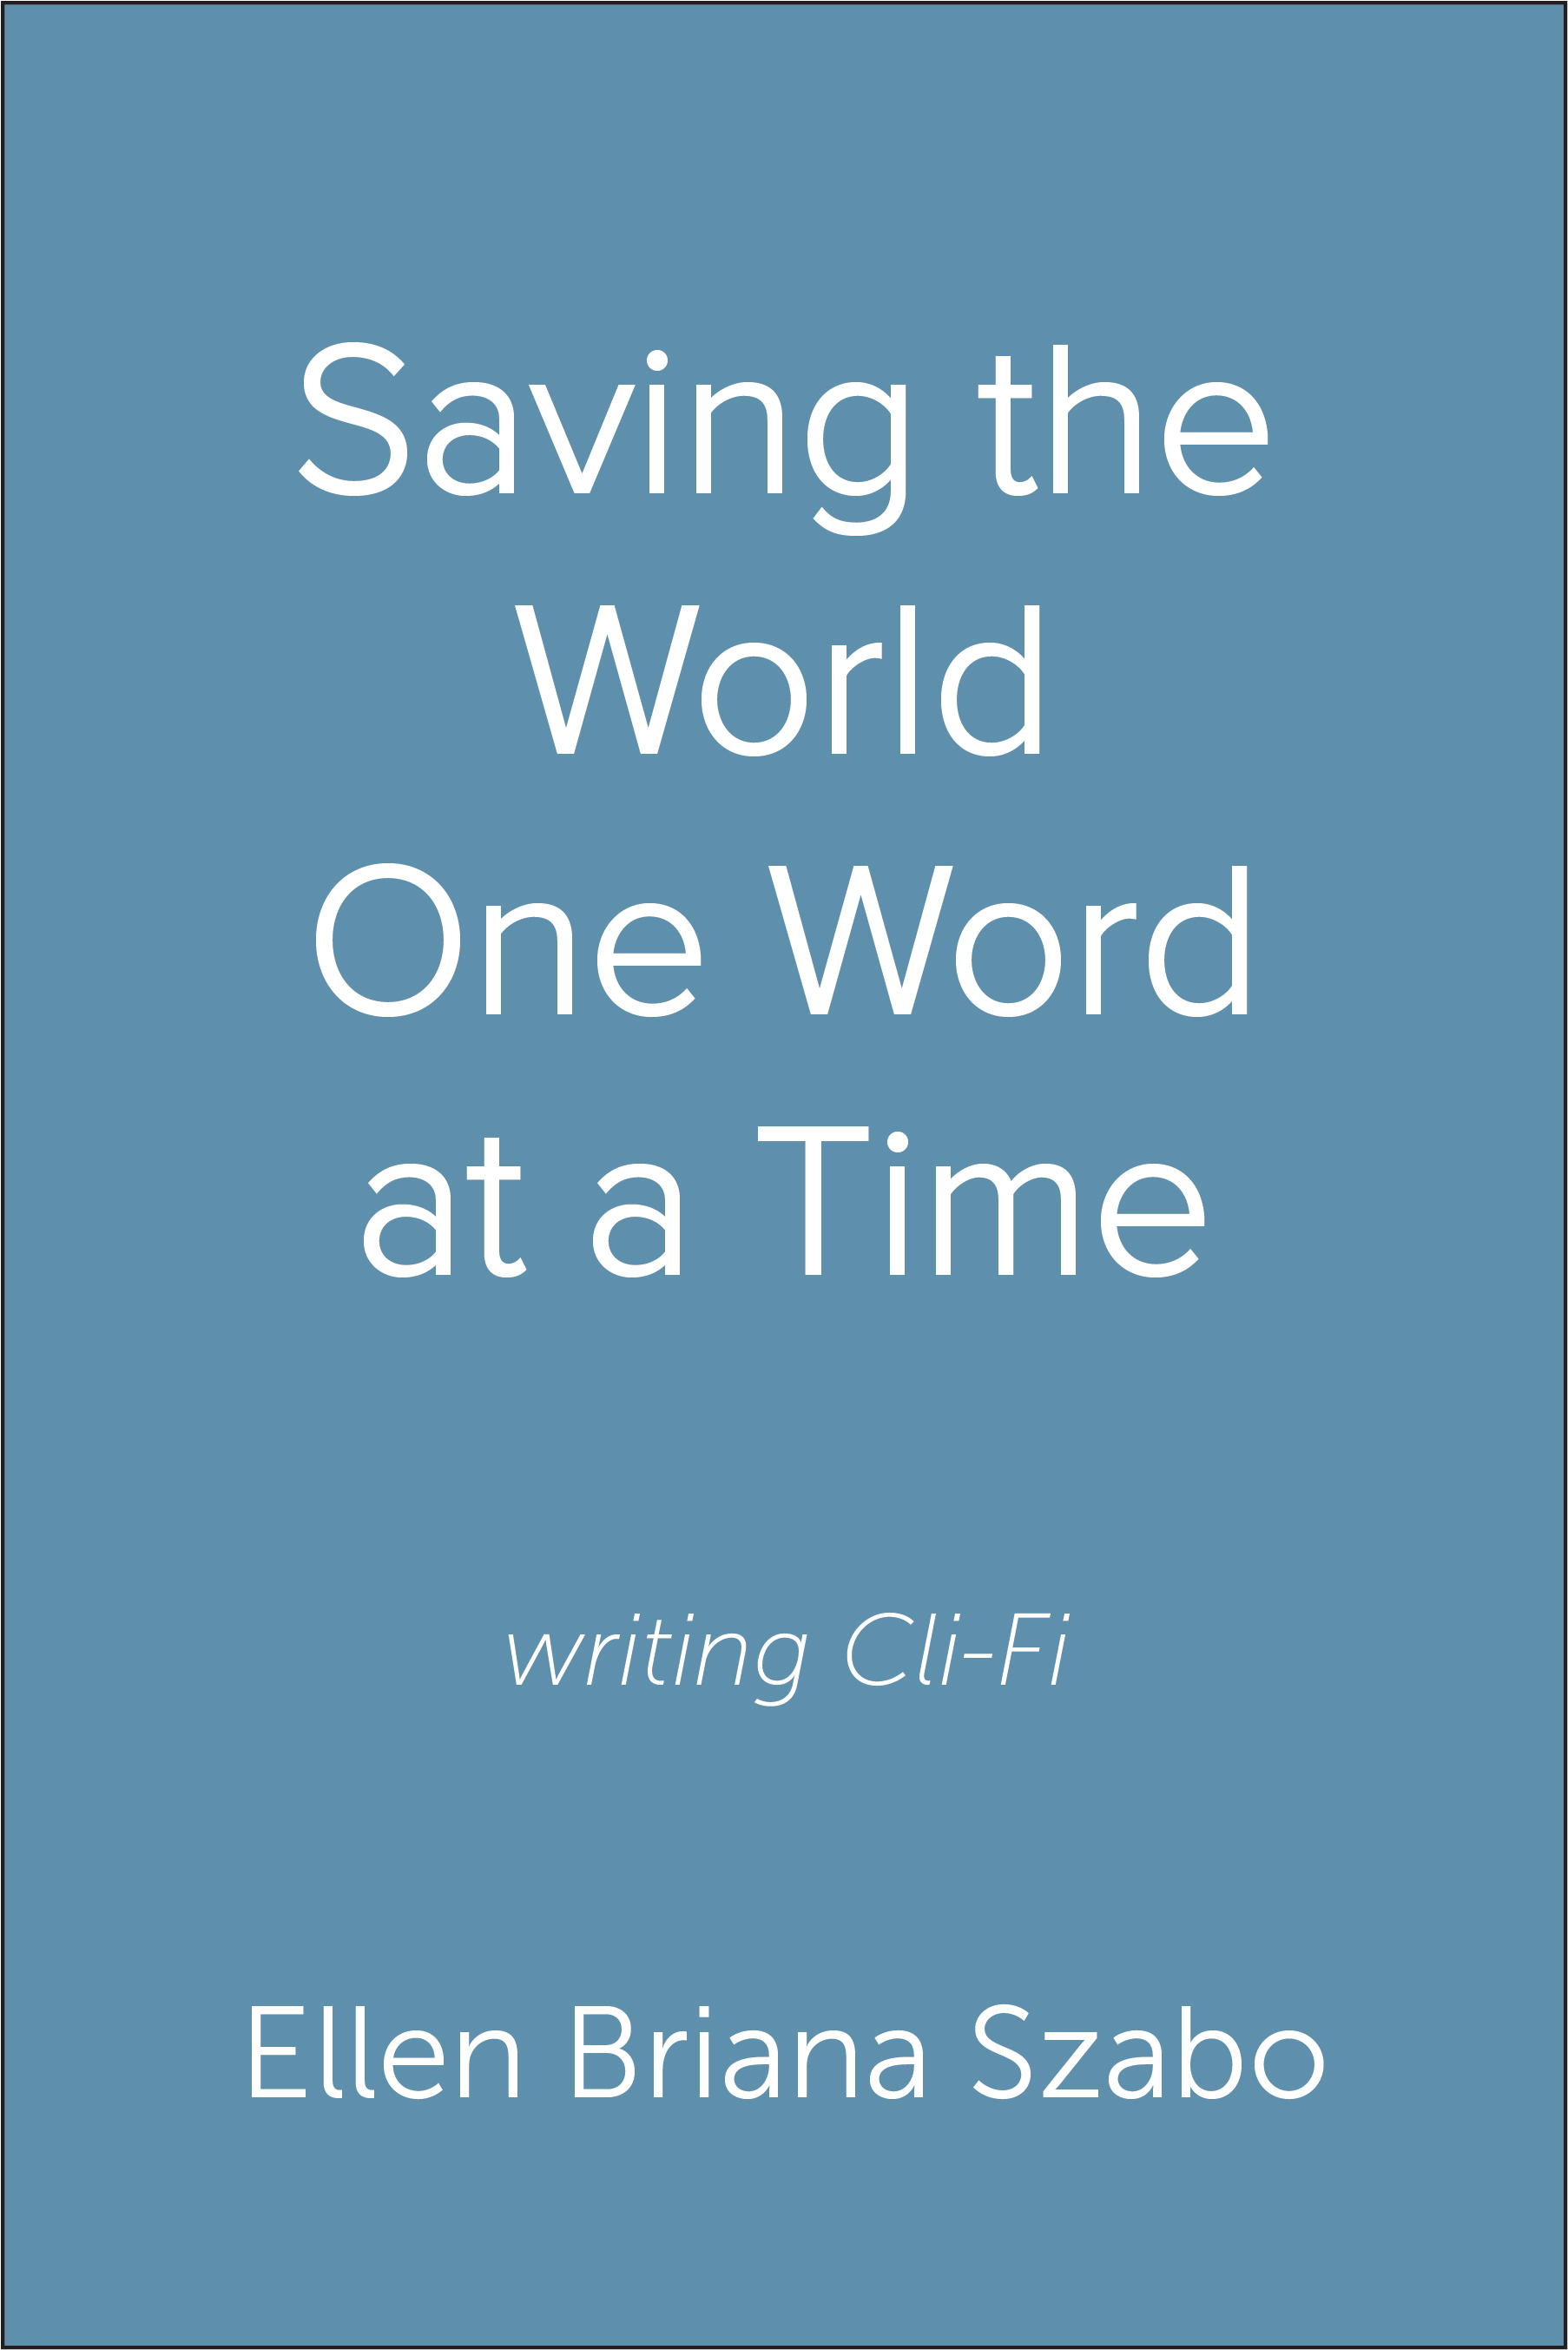 saving the world ebook cover.jpg